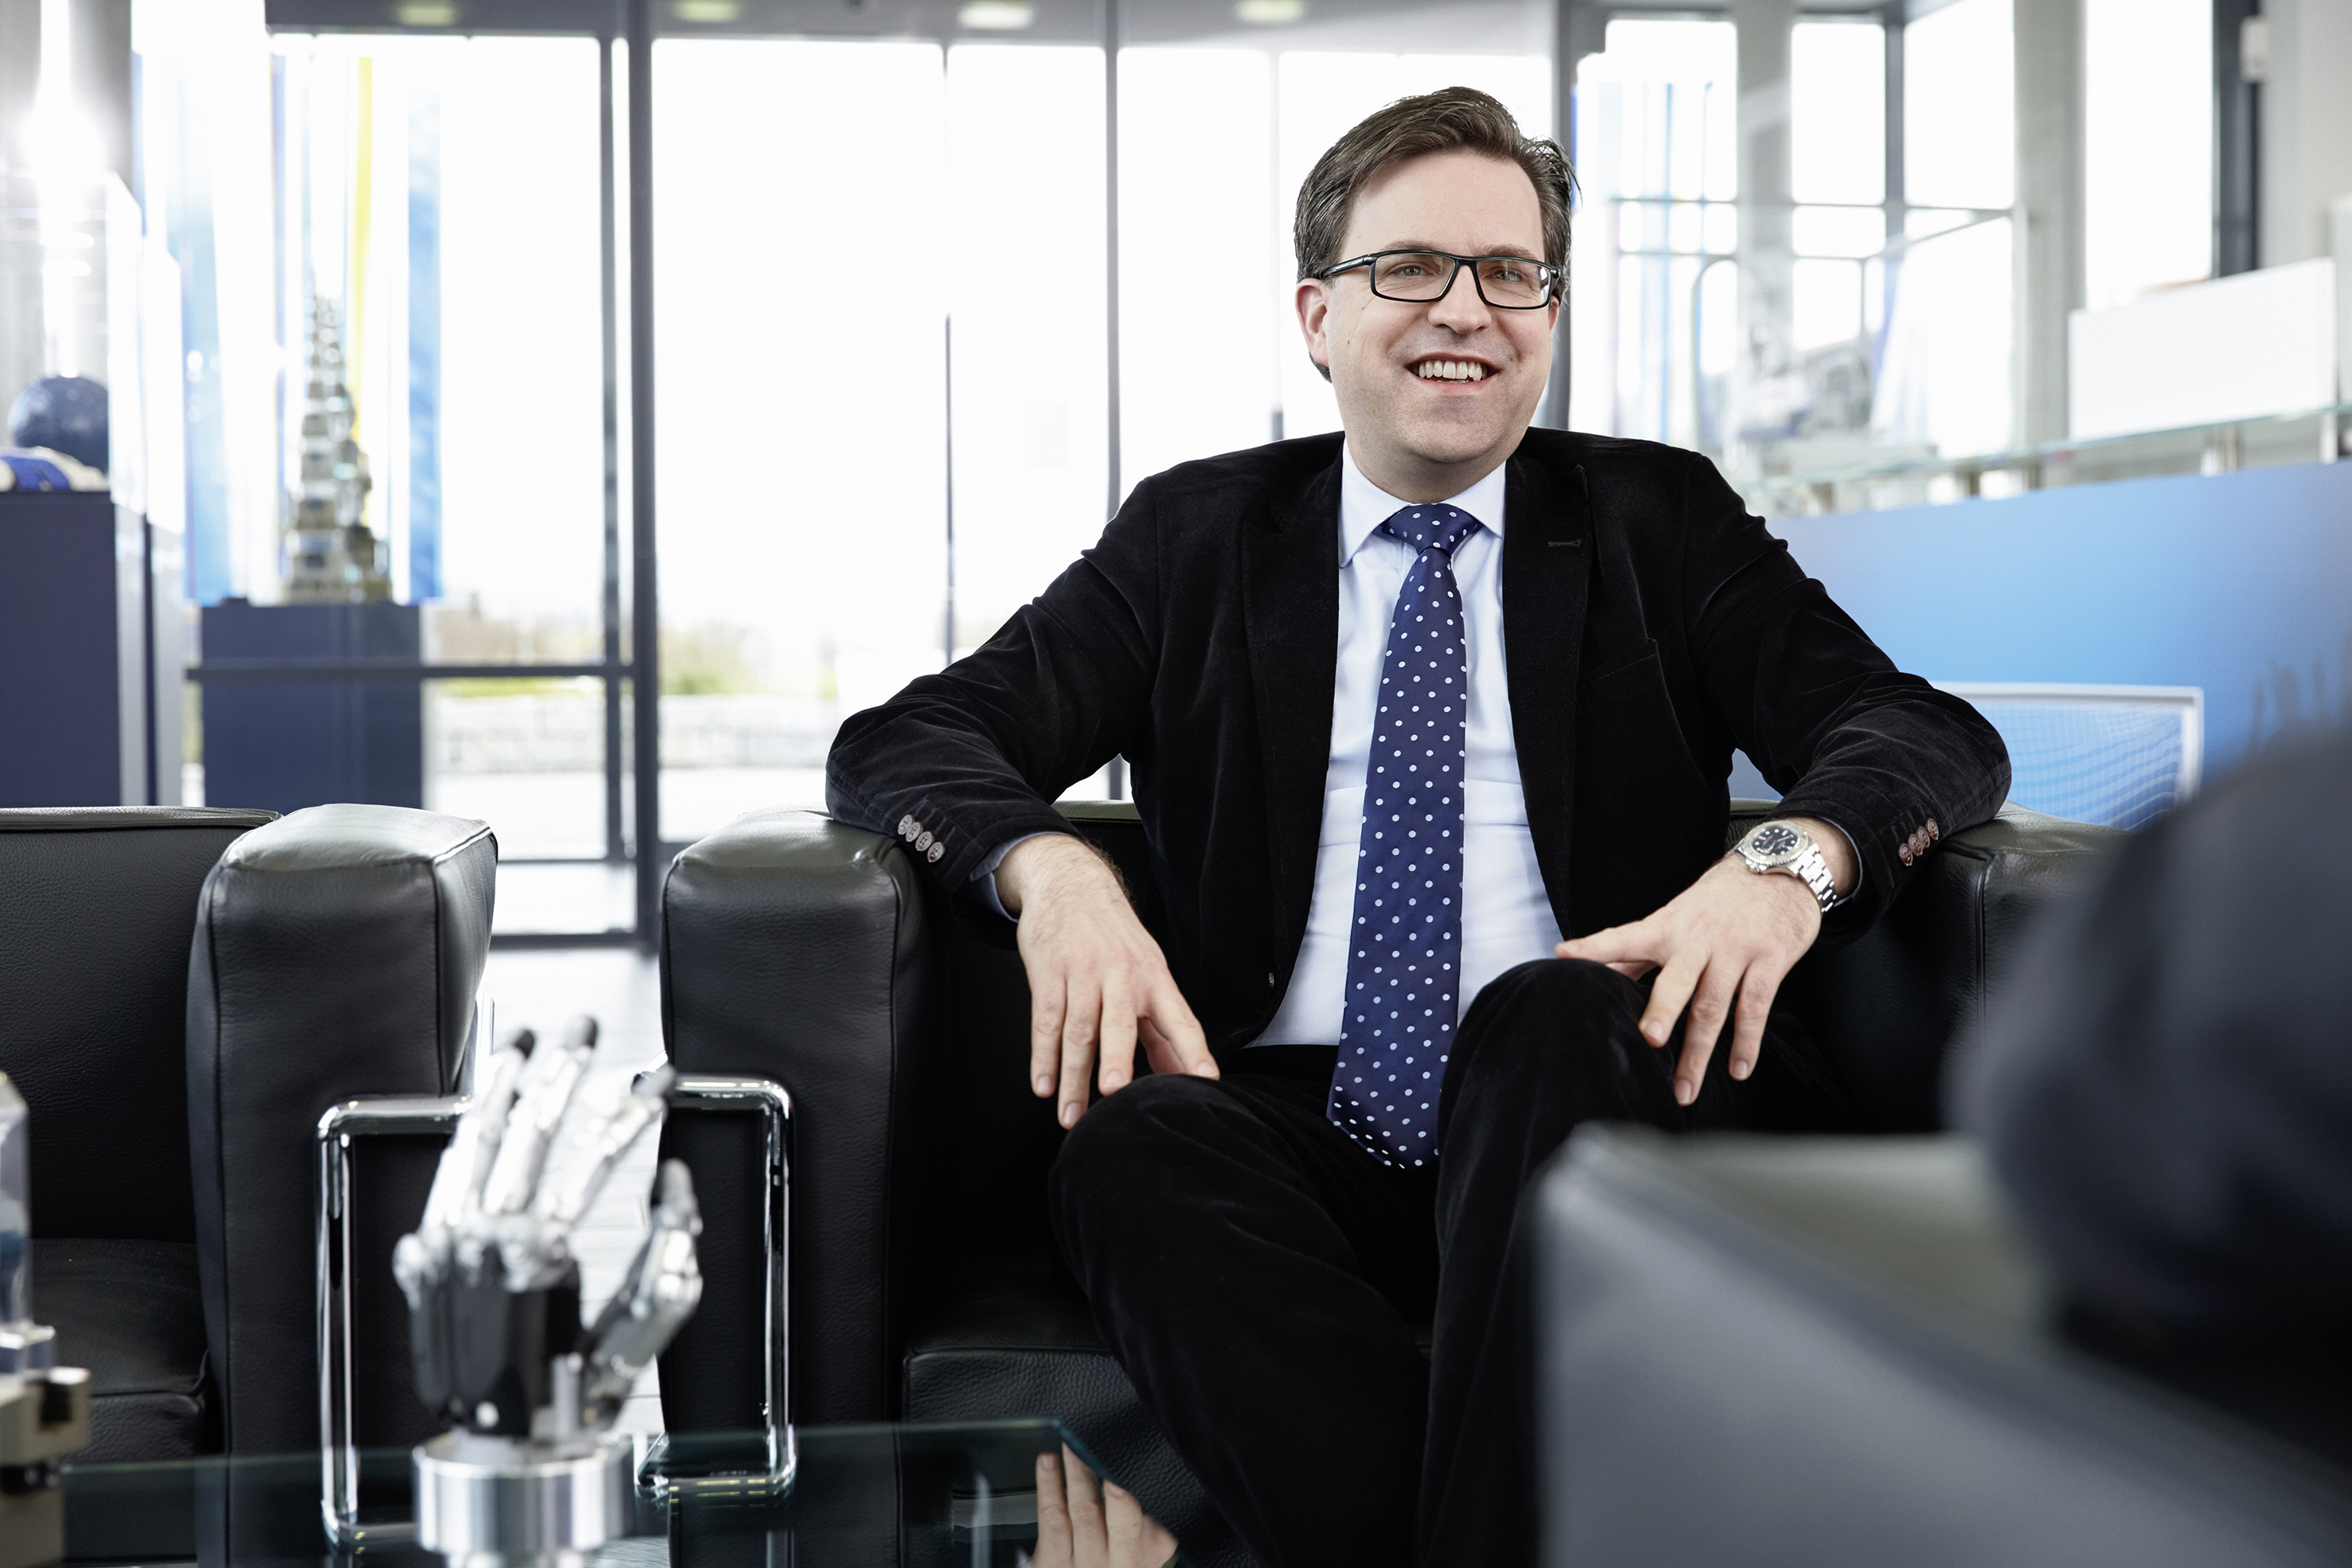 Henrik A. Schunk Chief Executive Officer SCHUNK GmbH & Co. KG, Lauffen/Neckar, Germany Photo: SCHUNK